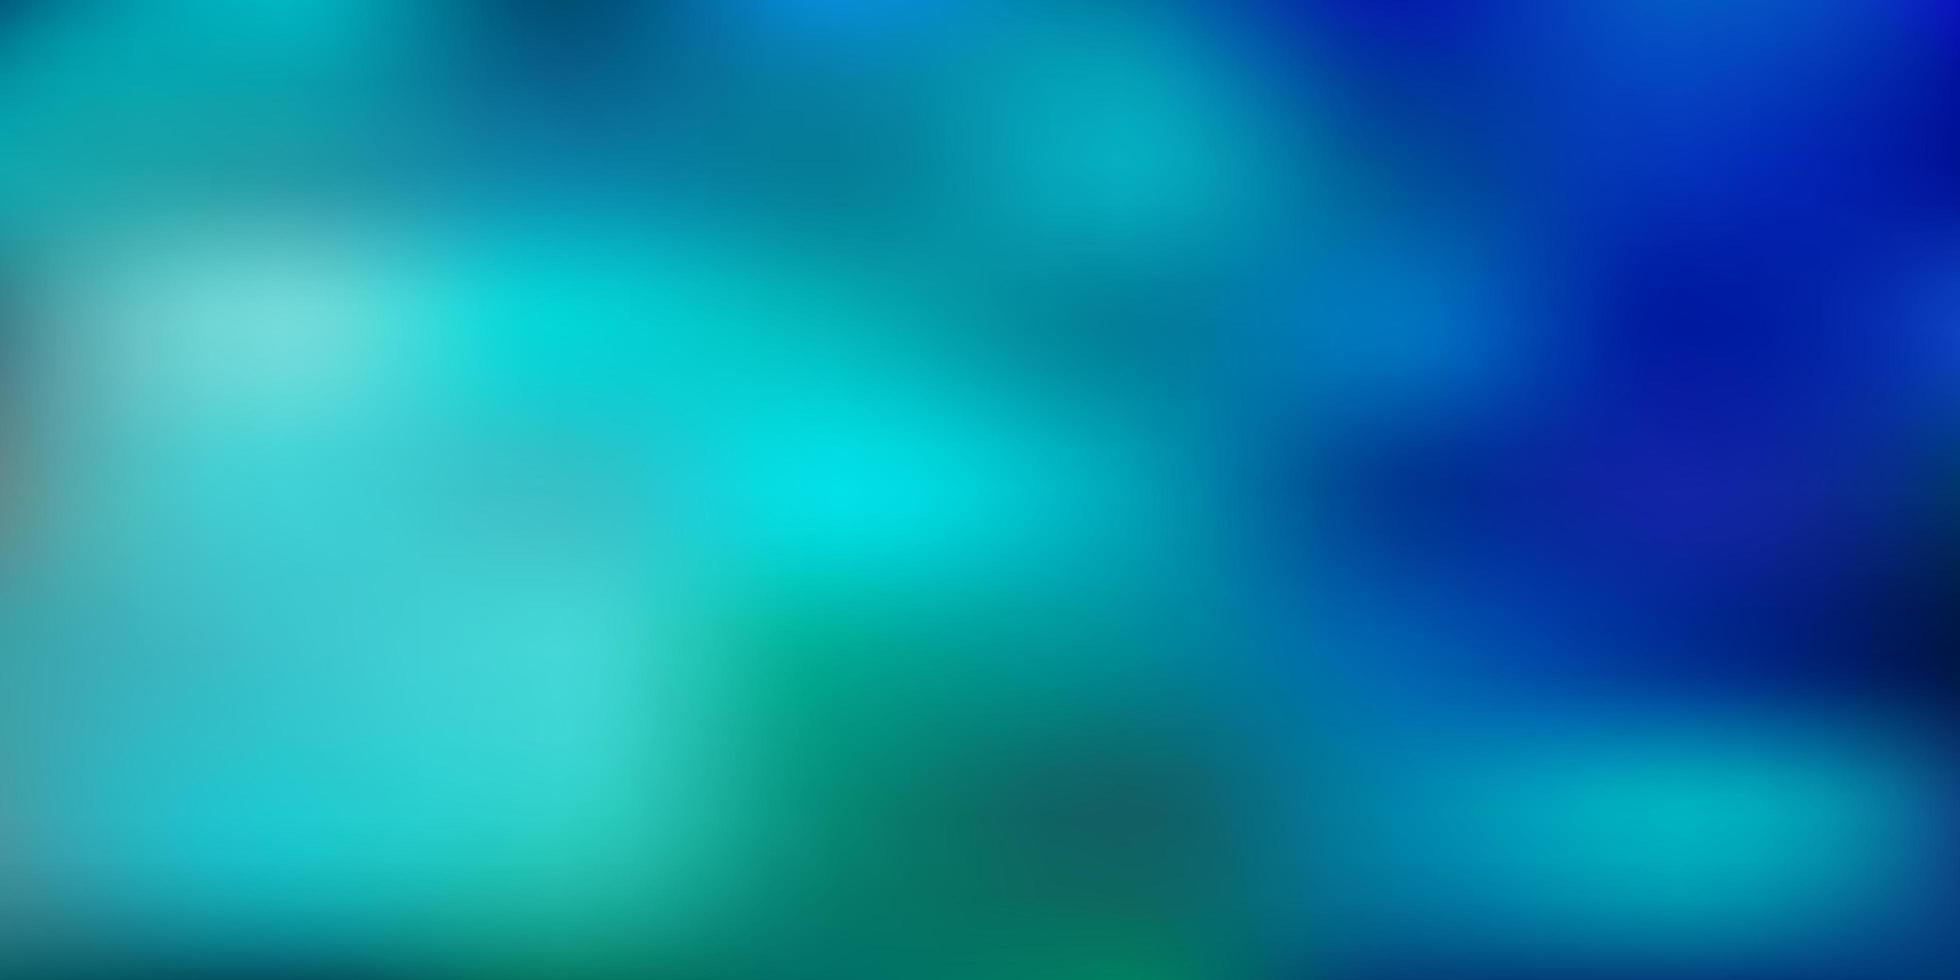 Light blue, green vector blurred background.